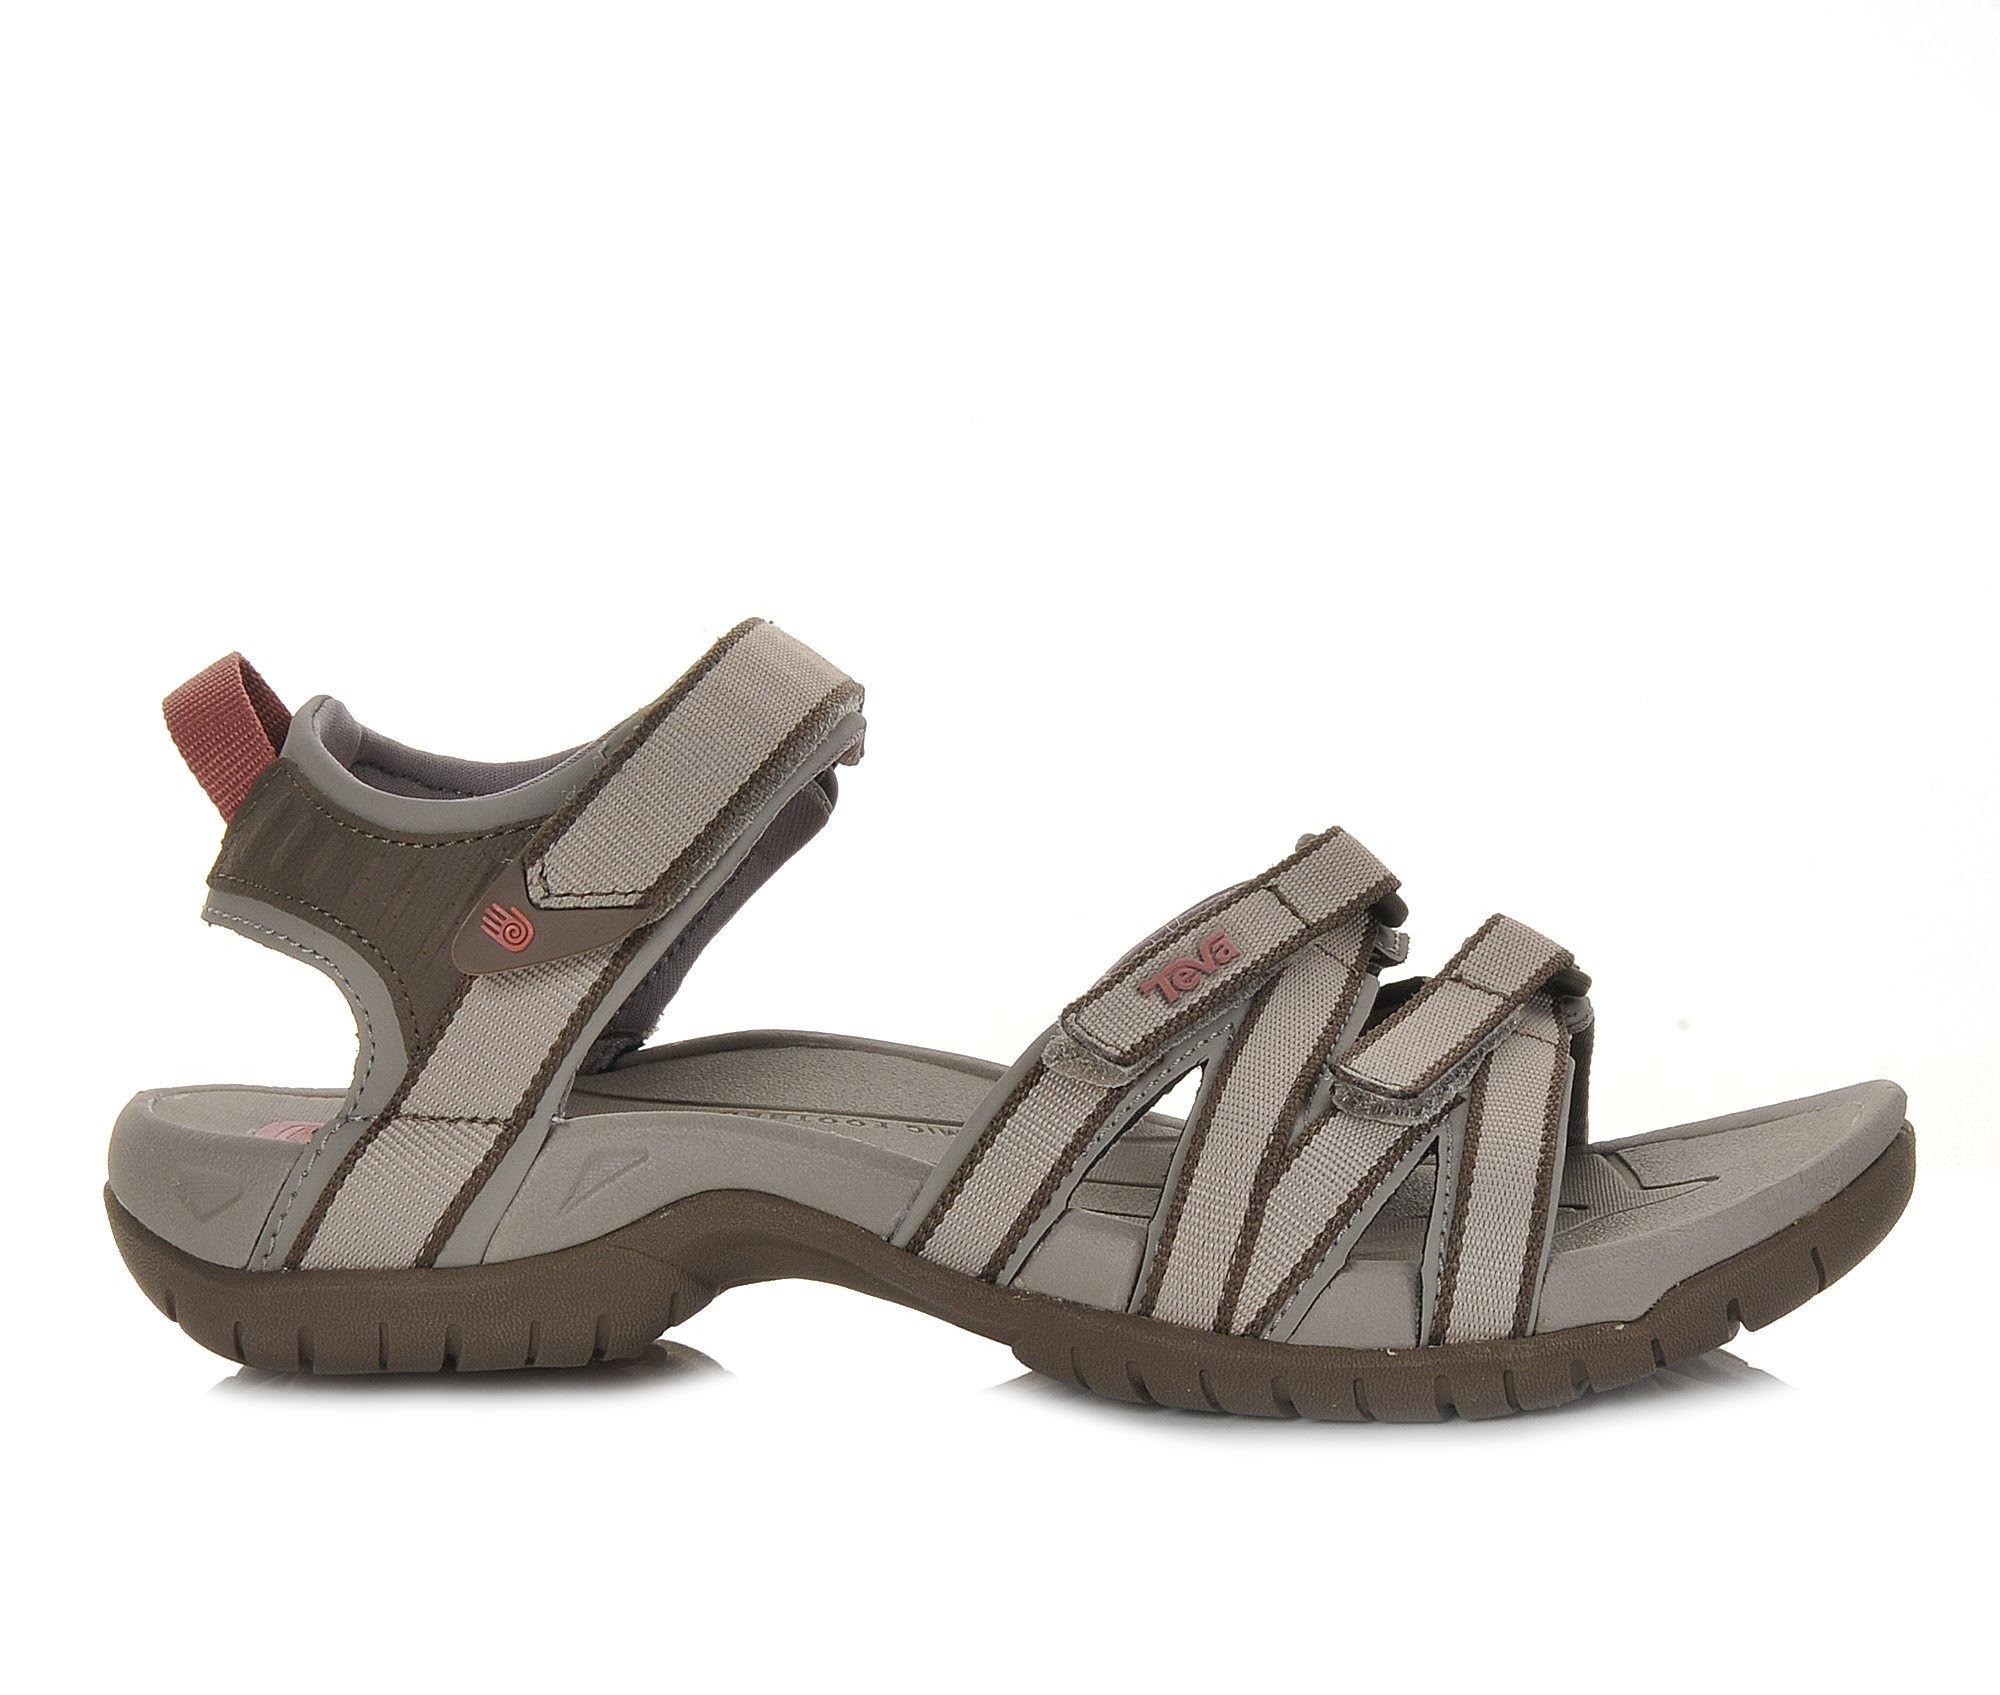 Women's Teva Tirra Sandals (Beige)